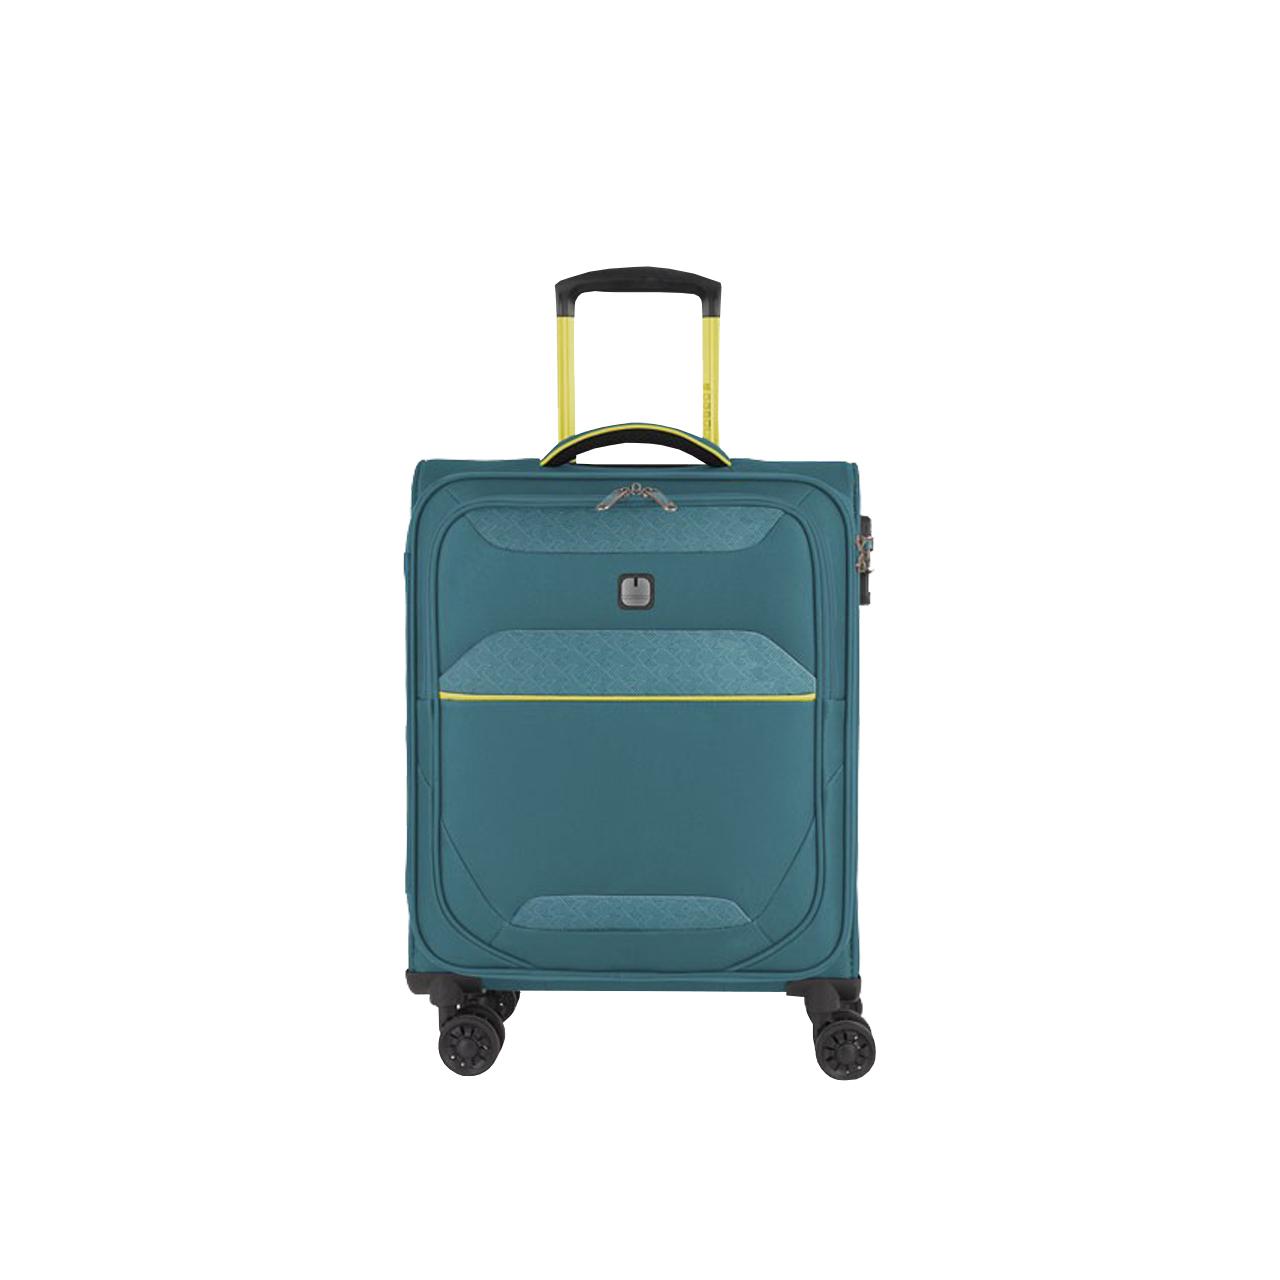 چمدان گابل مدل Giro سایز کوچک